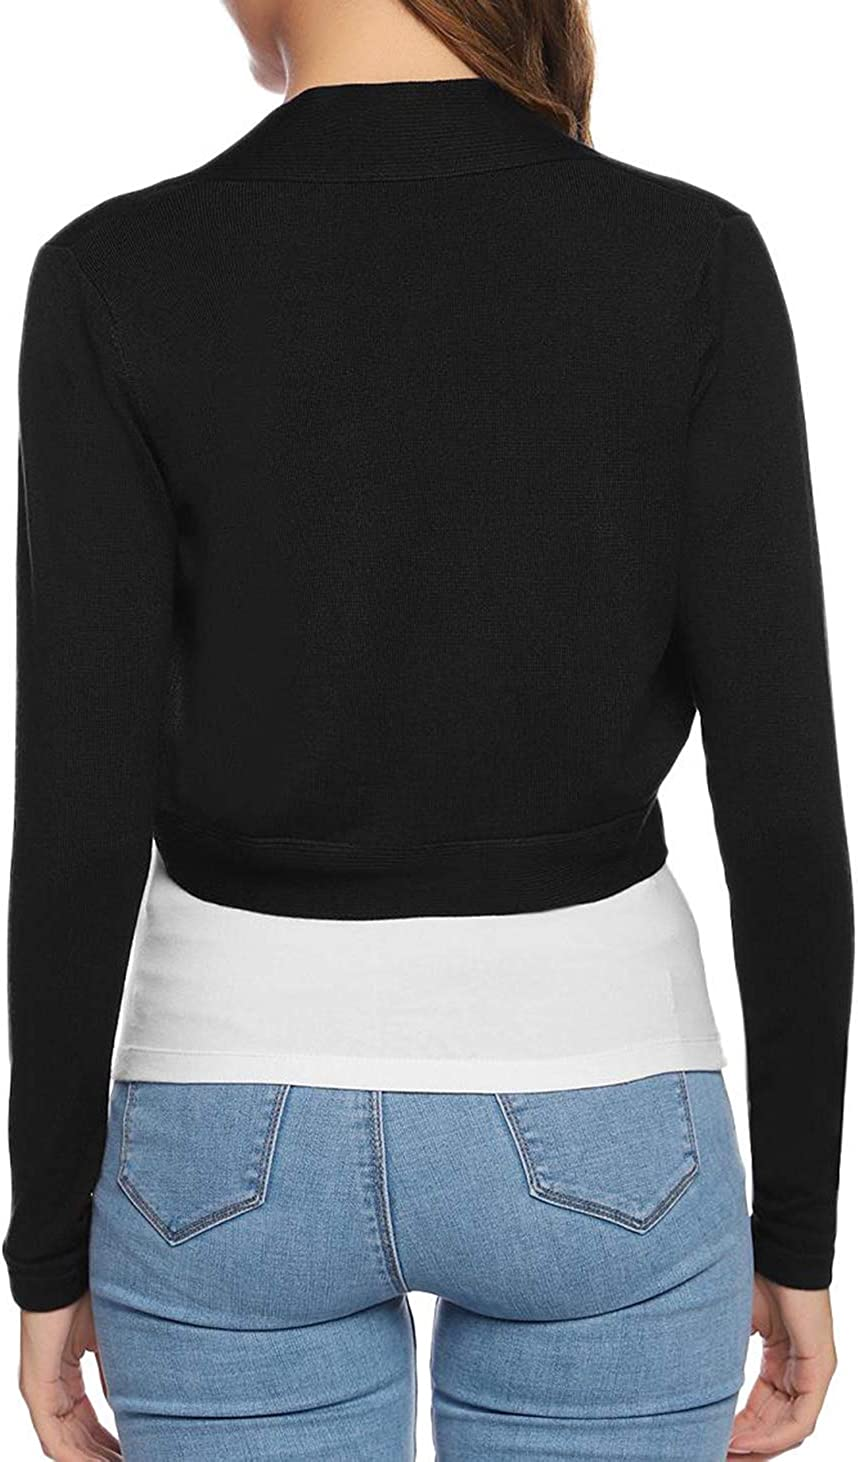 Akalnny Women Long Sleeve Open Front Bolero Shrug Knitted Cropped Cardigans